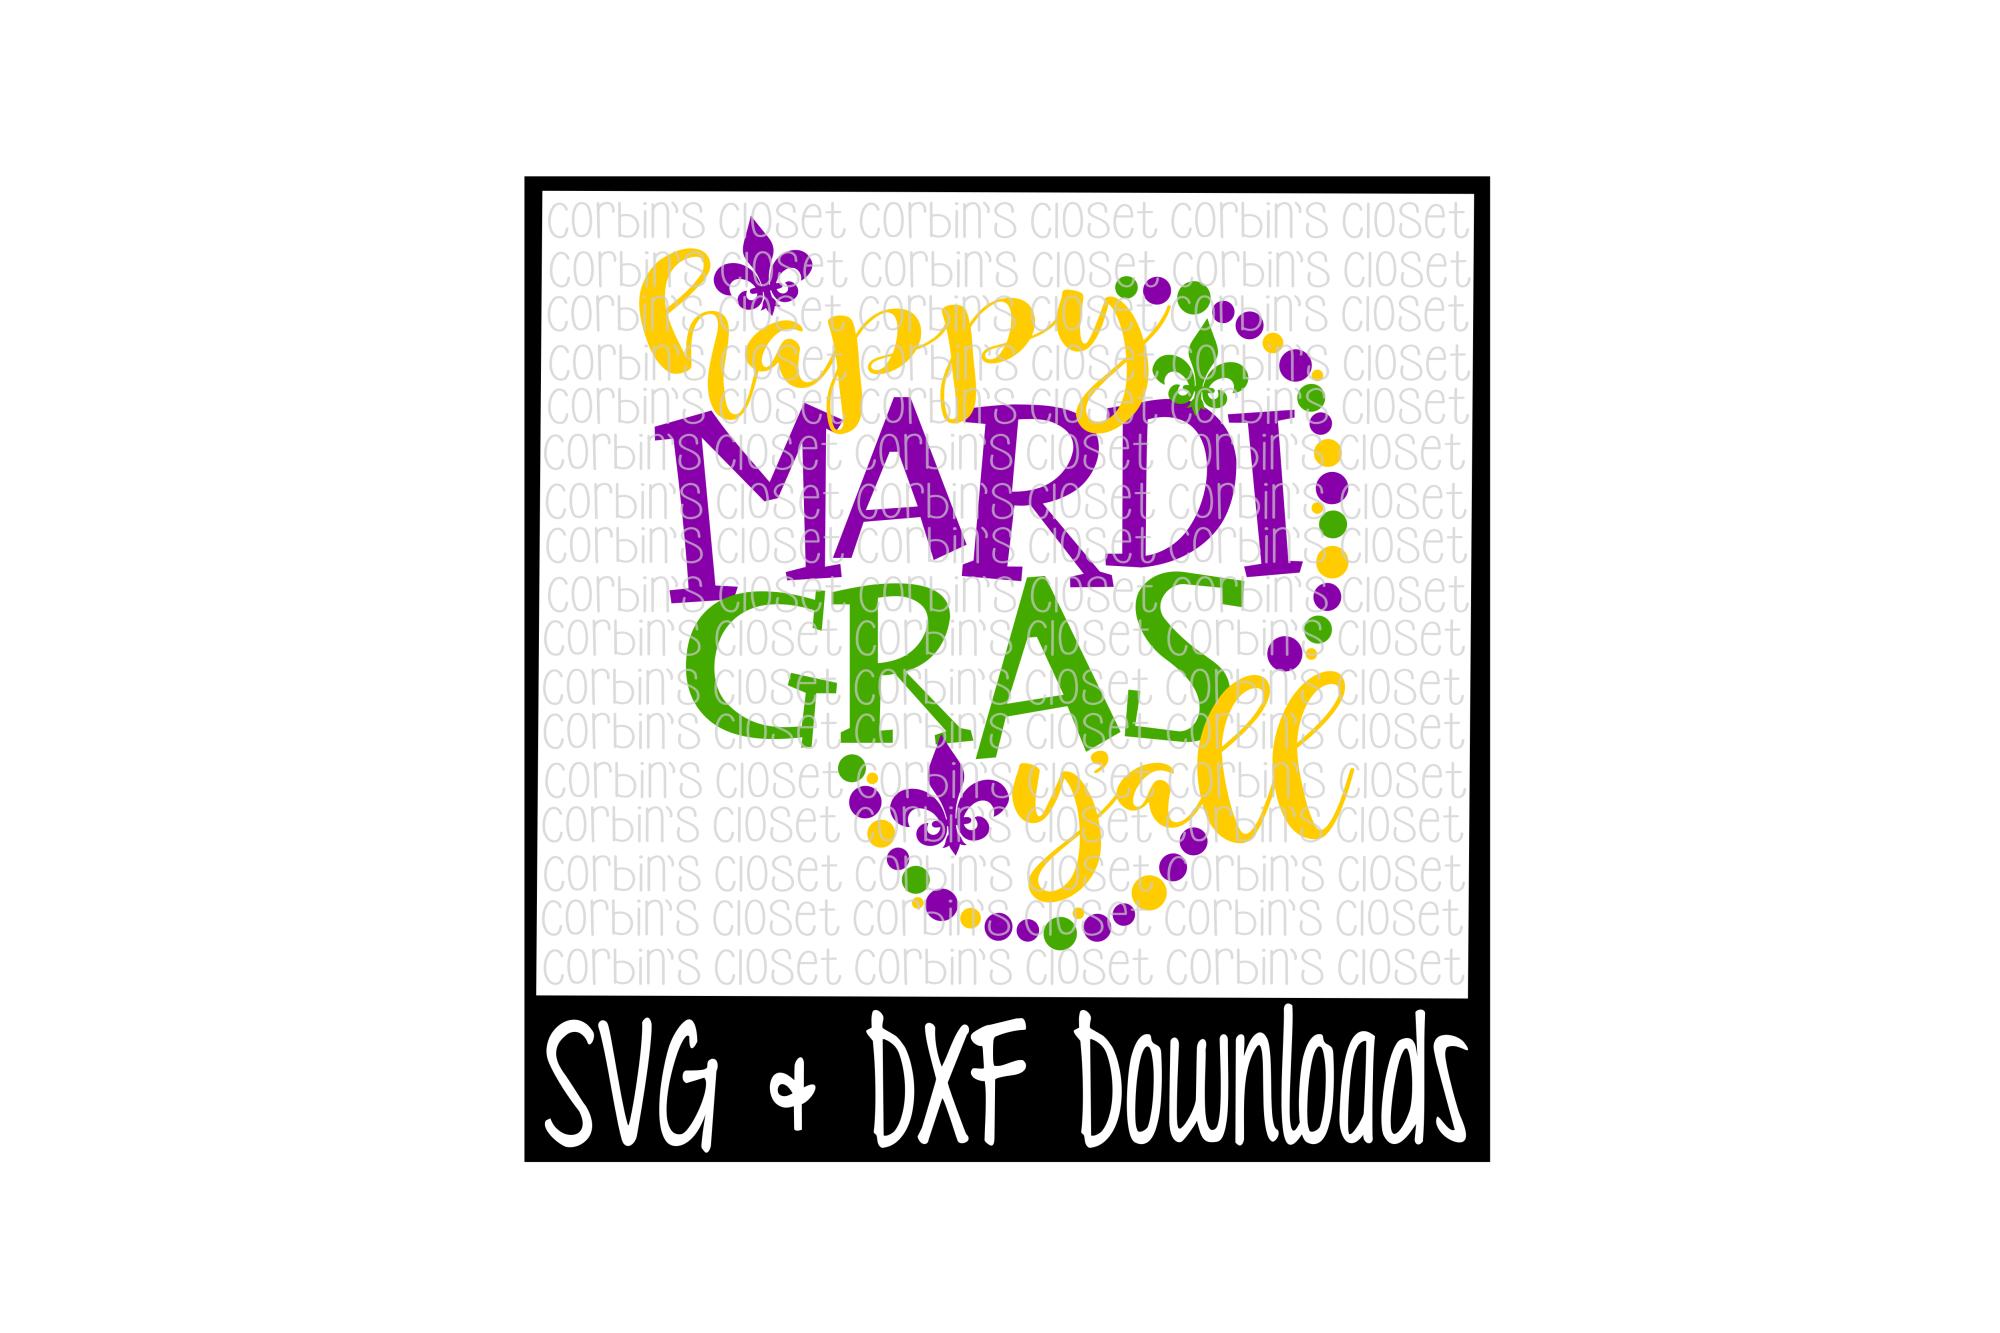 Mardi Gras SVG * Happy Mardi Gras Y'all * Beads Cut File example image 1